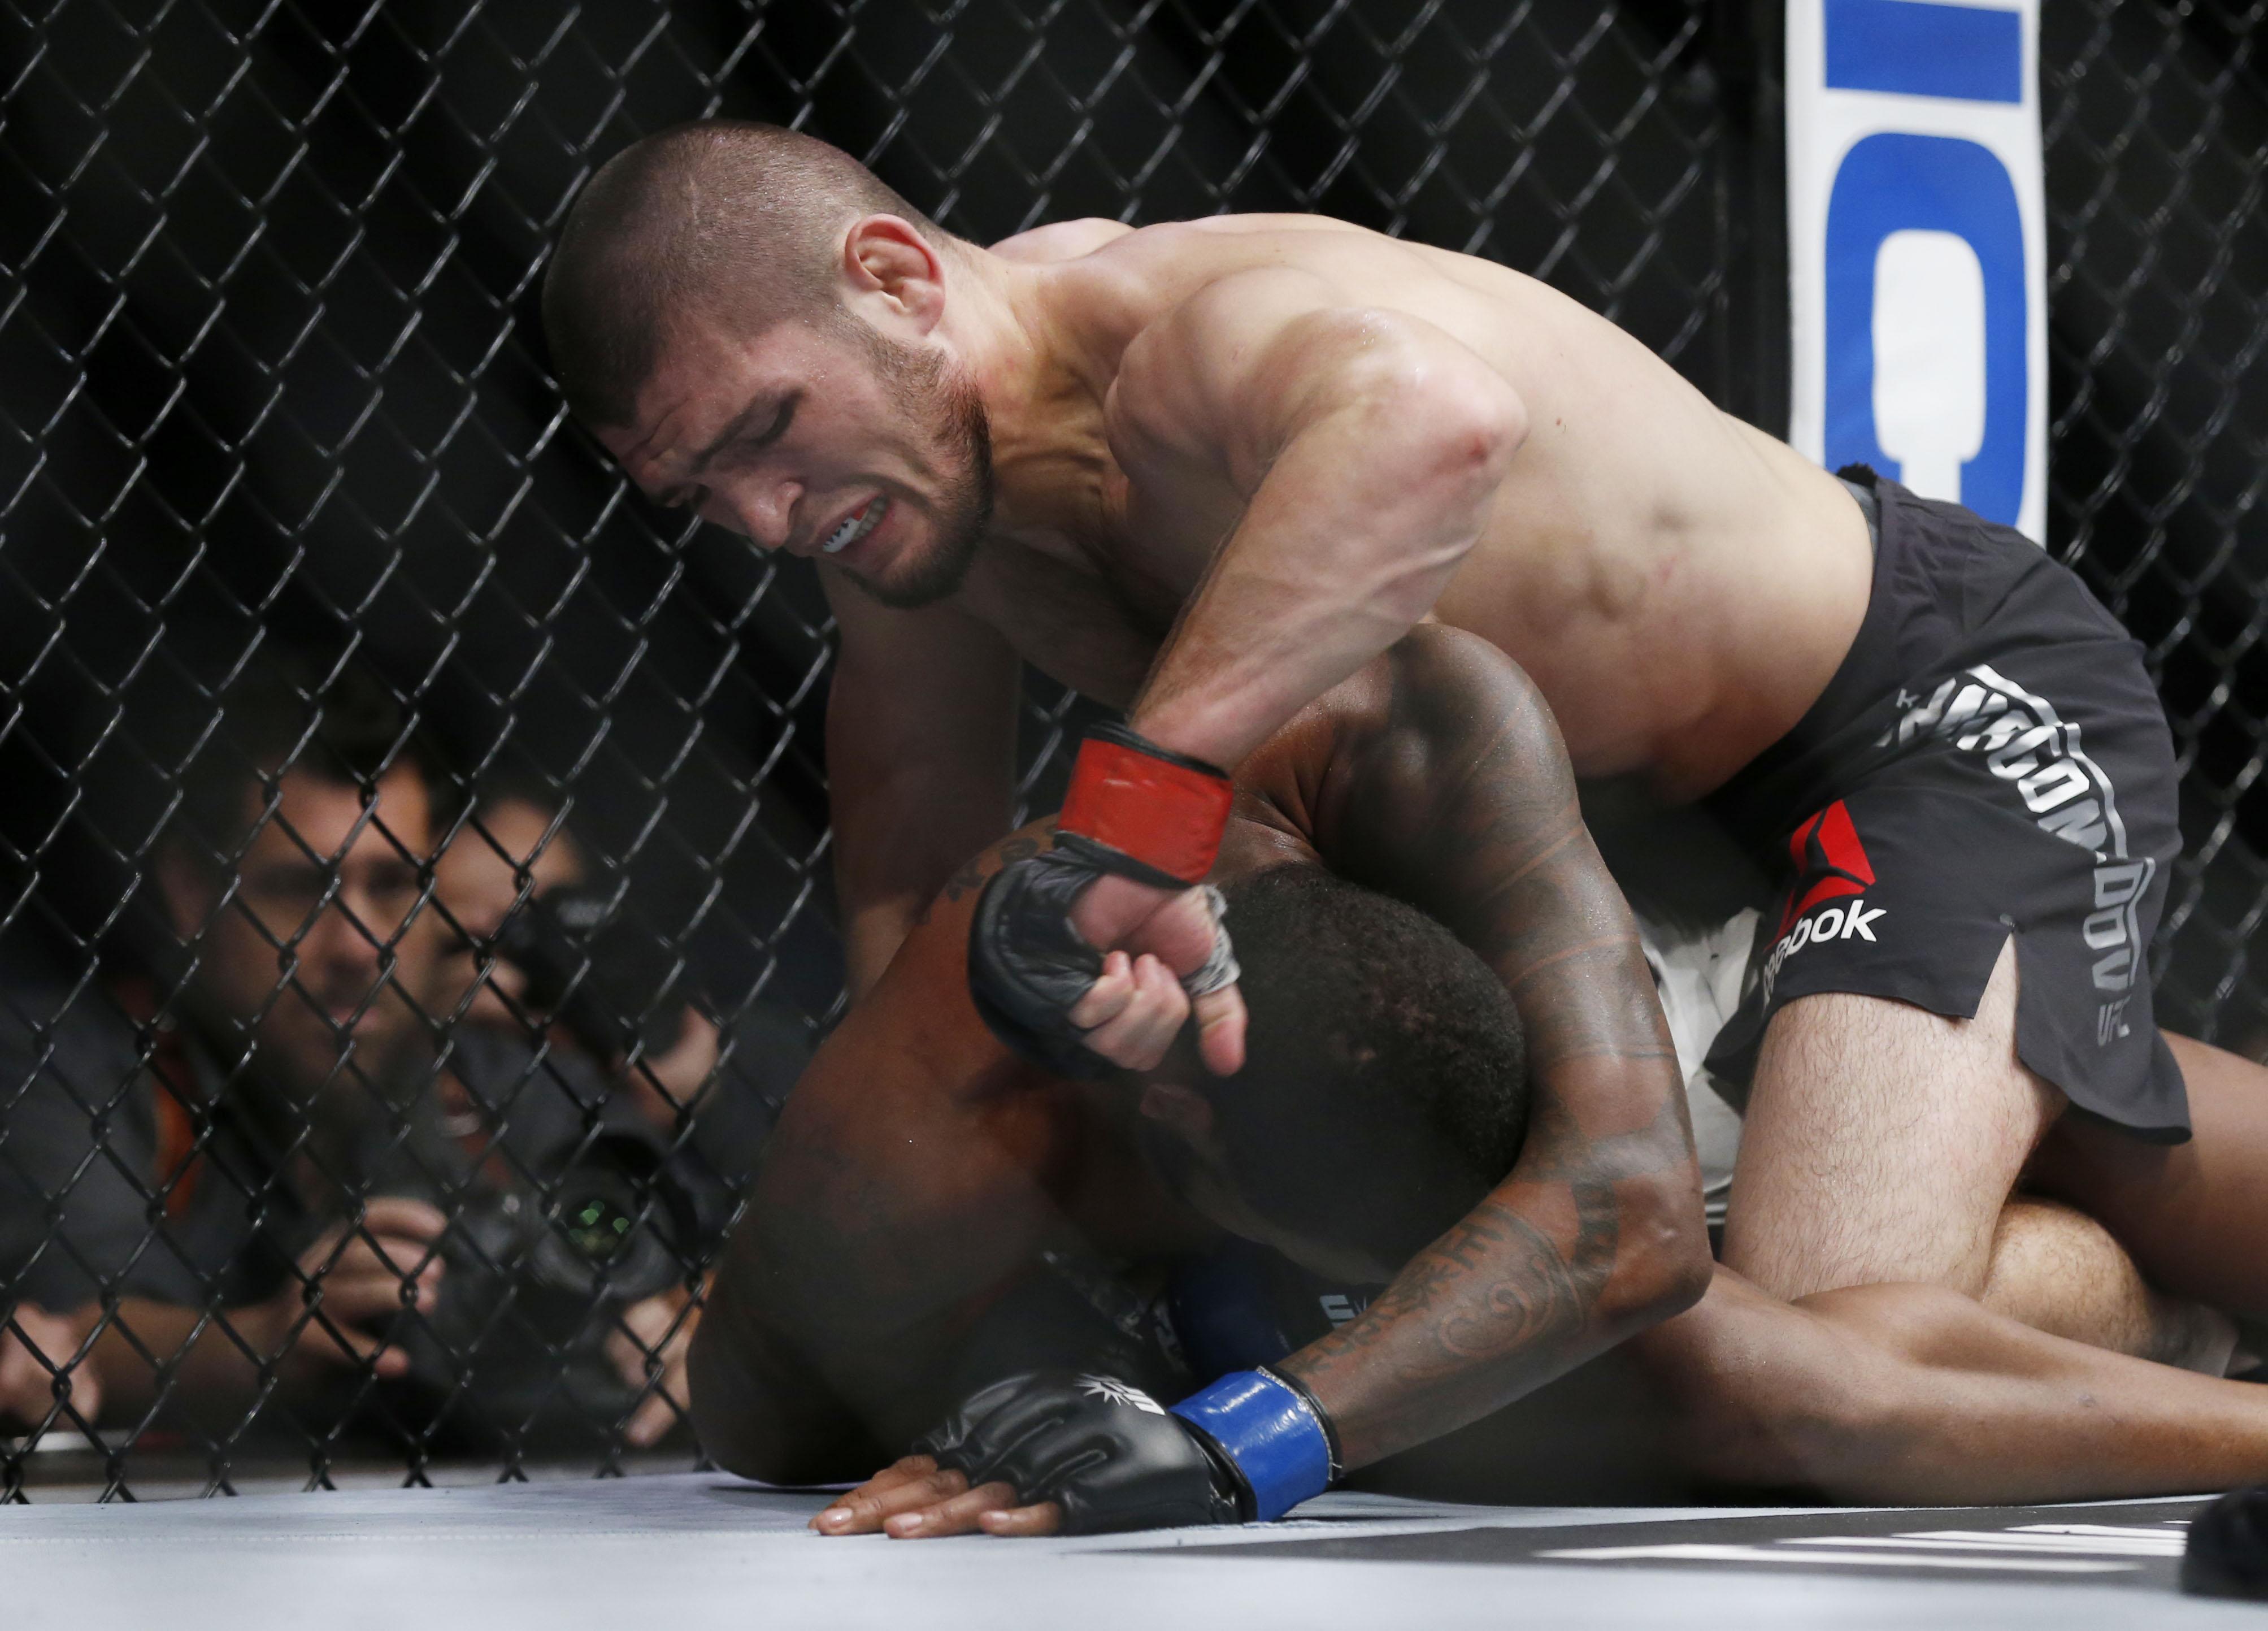 MMA: Cyborg retains UFC women's featherweight belt